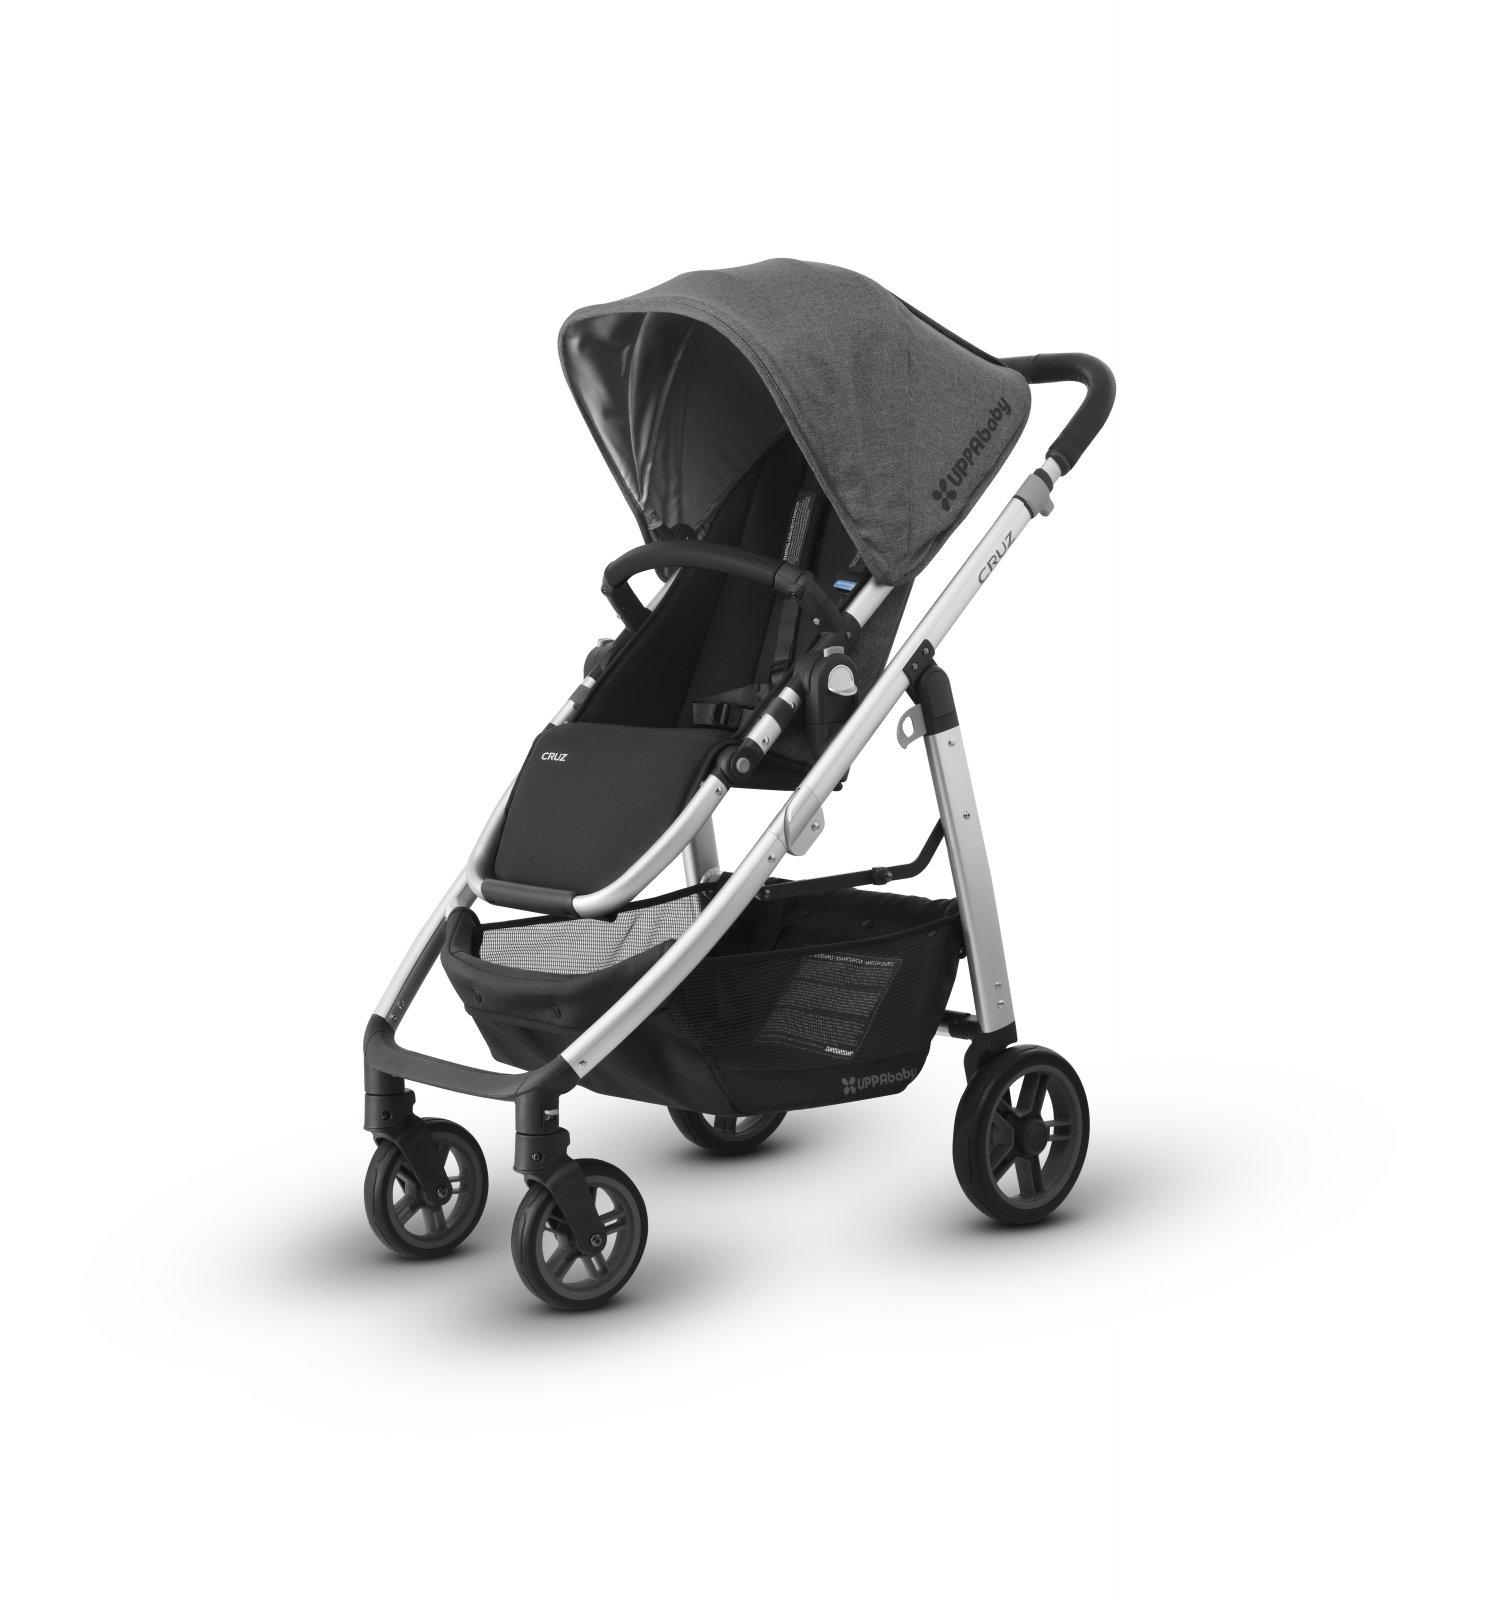 UPPAbaby CRUZ Stroller - JORDAN (Charcoal/Silver)